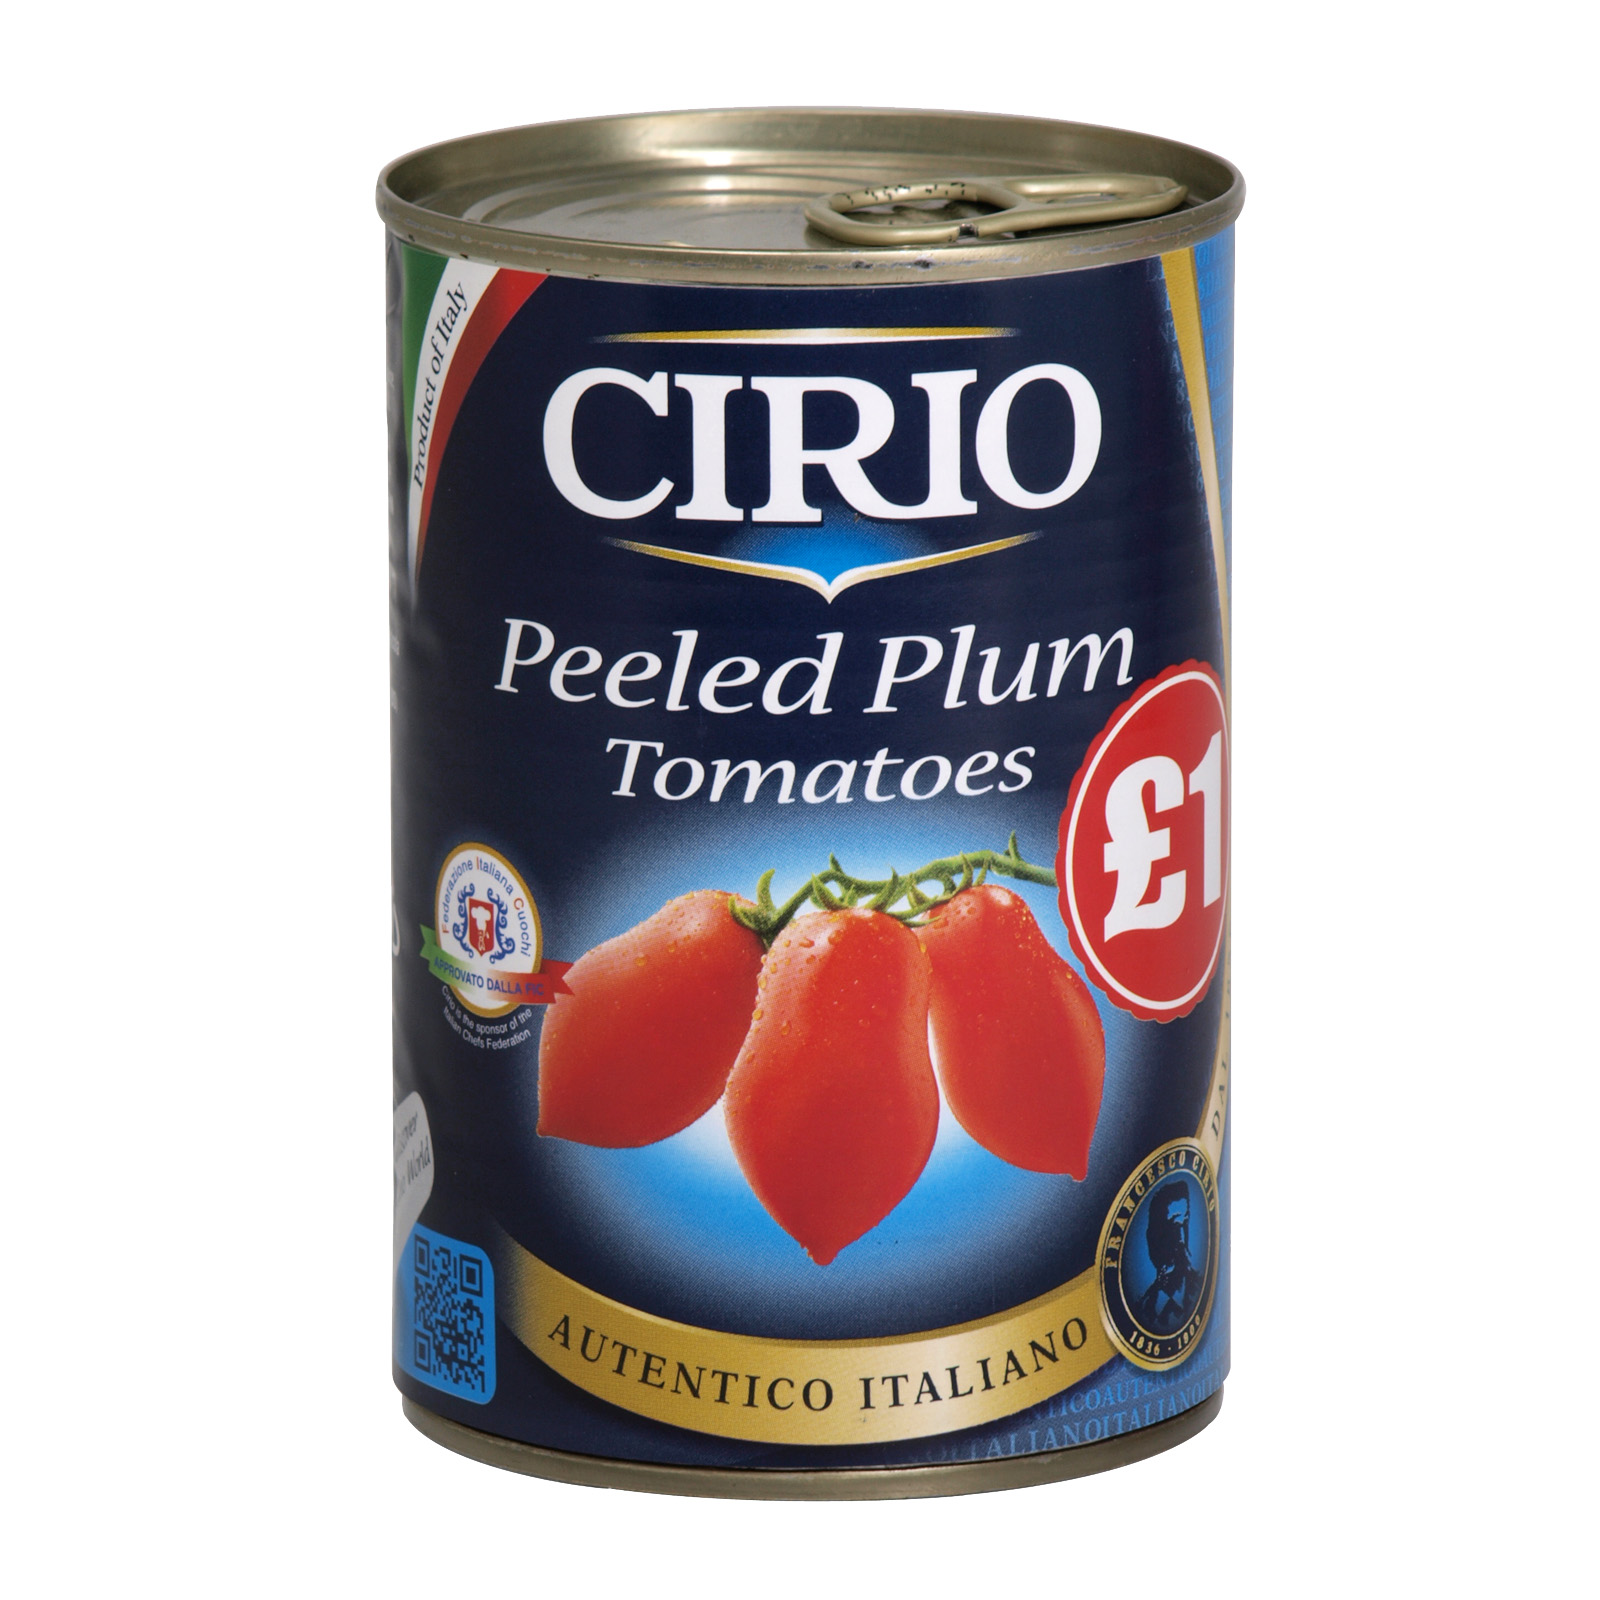 CIRIO PLUM TOMATOES 400GM PM?1 X12